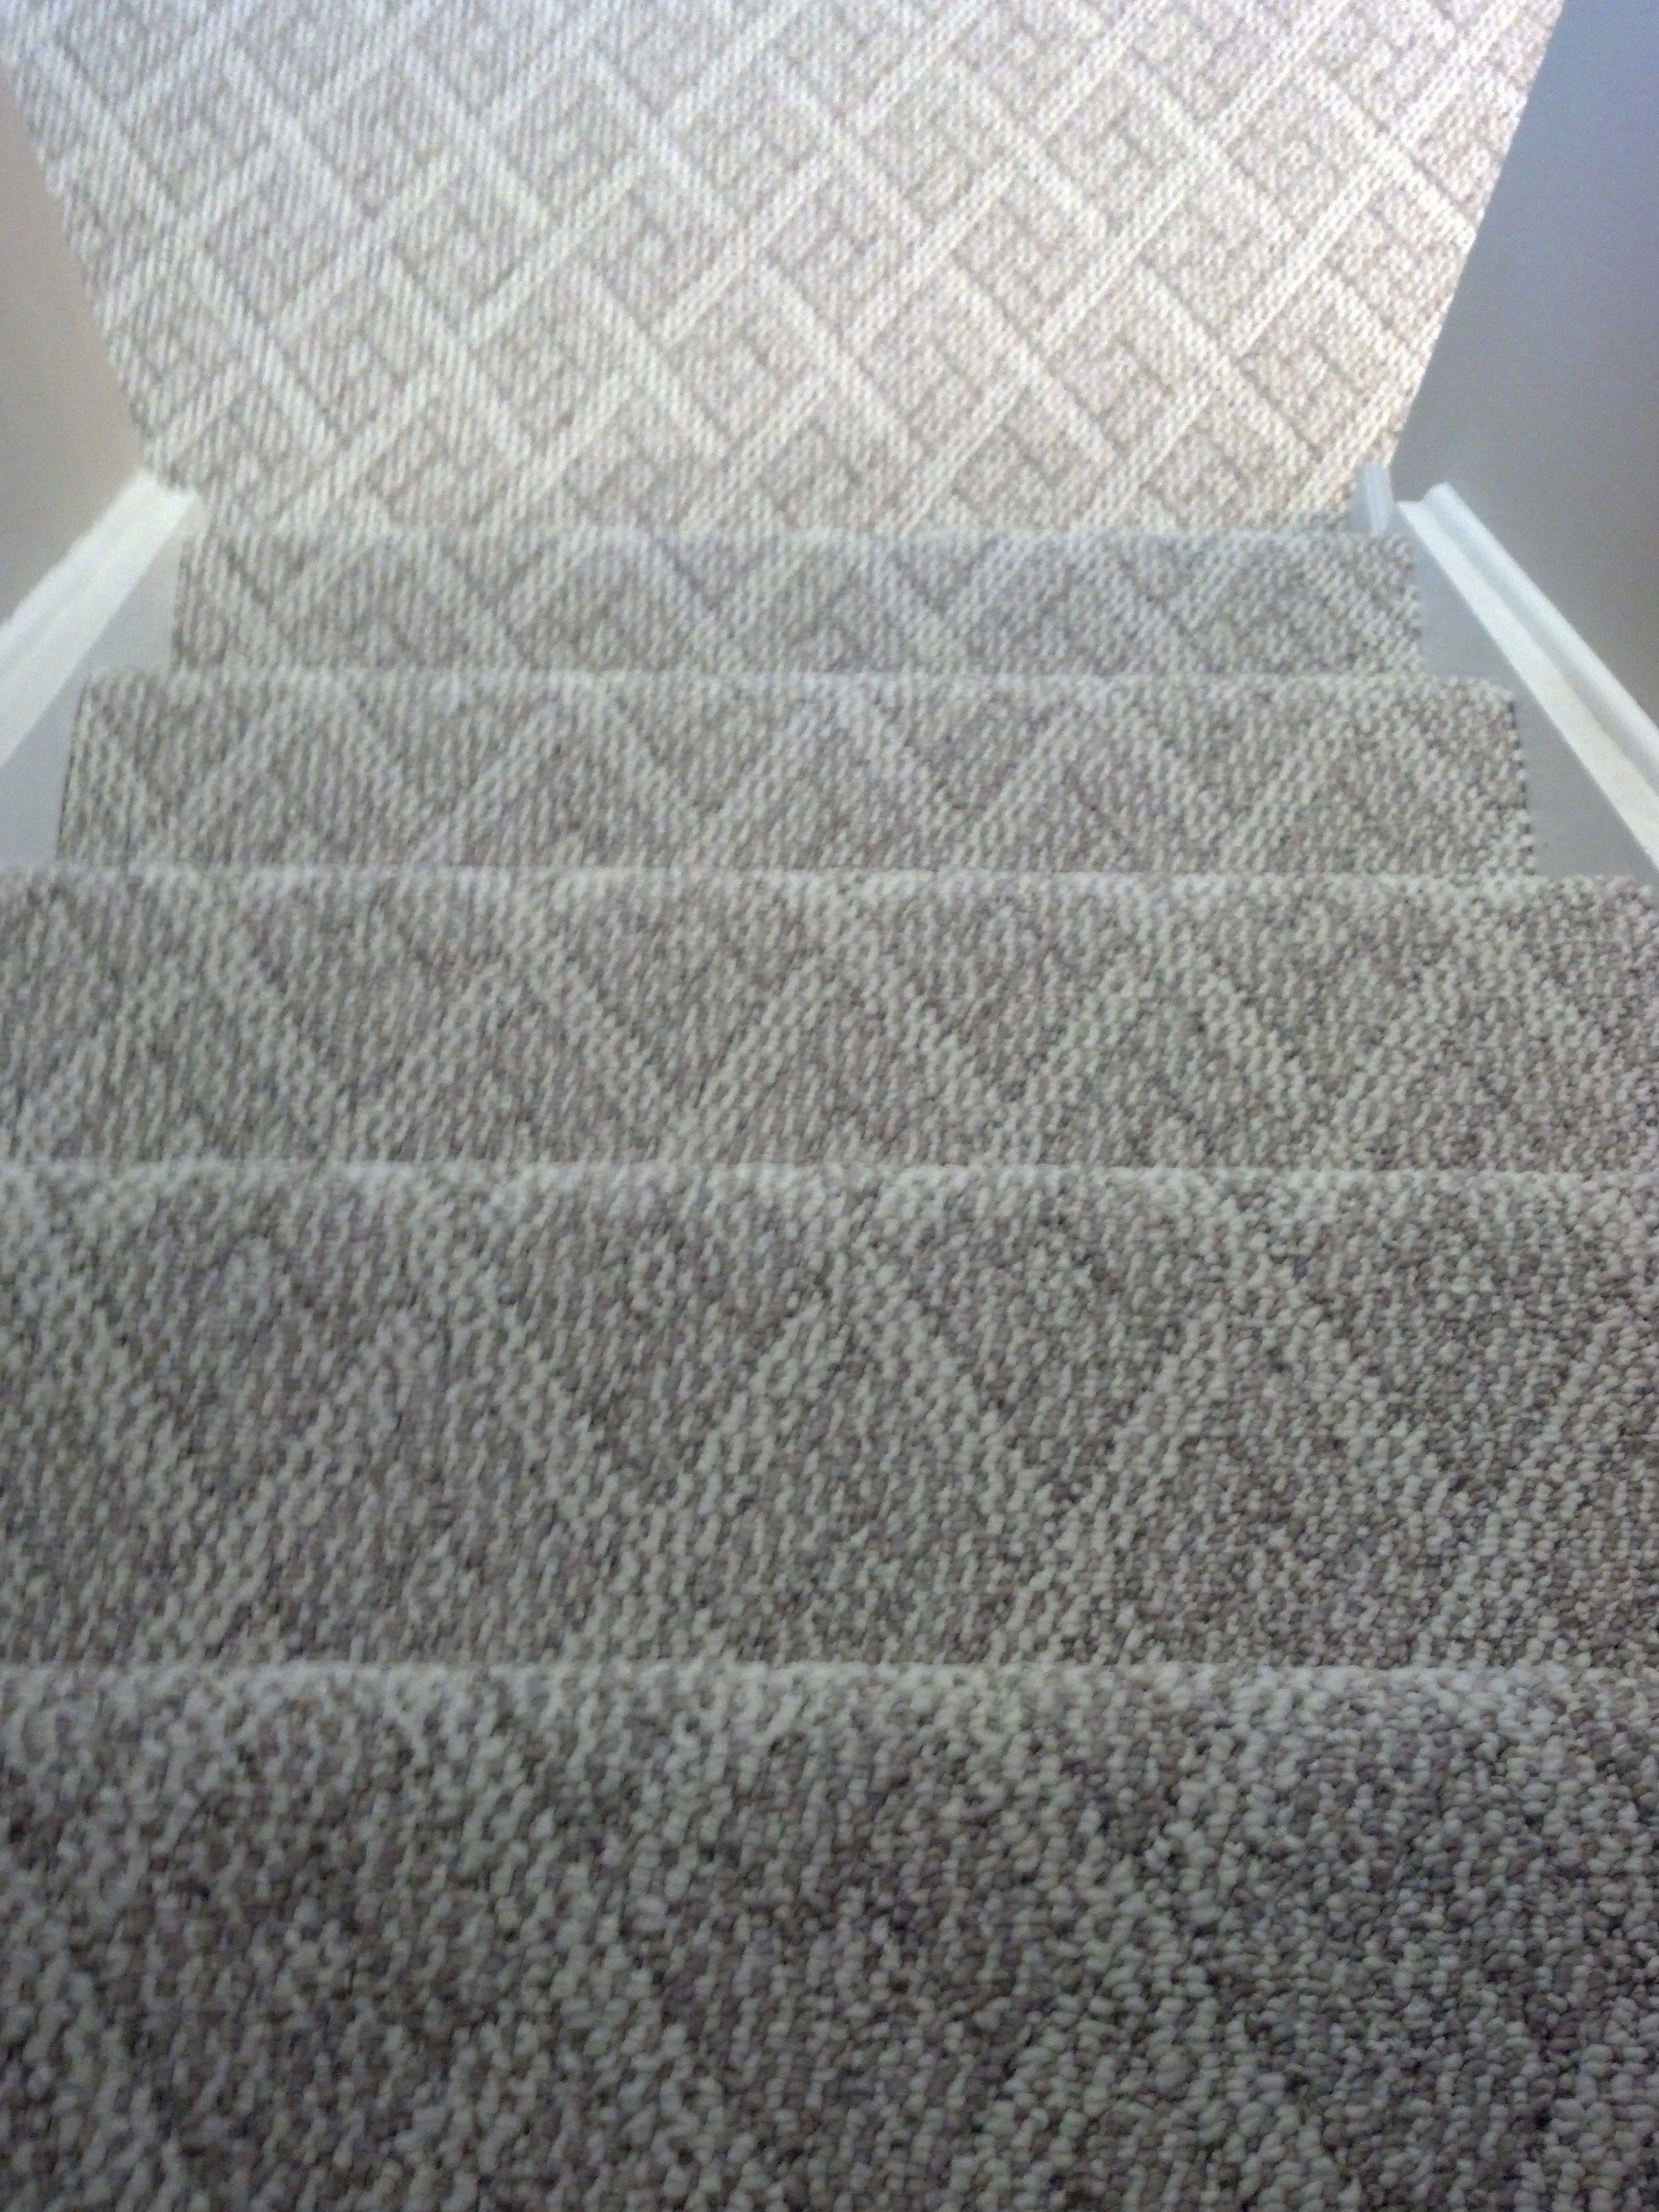 Berber Carpet Cincinnati Ohio Installed On Steps And Basement Family Room Note Notice The Pattern Lining Up Basement Carpet Patterned Carpet Room Carpet